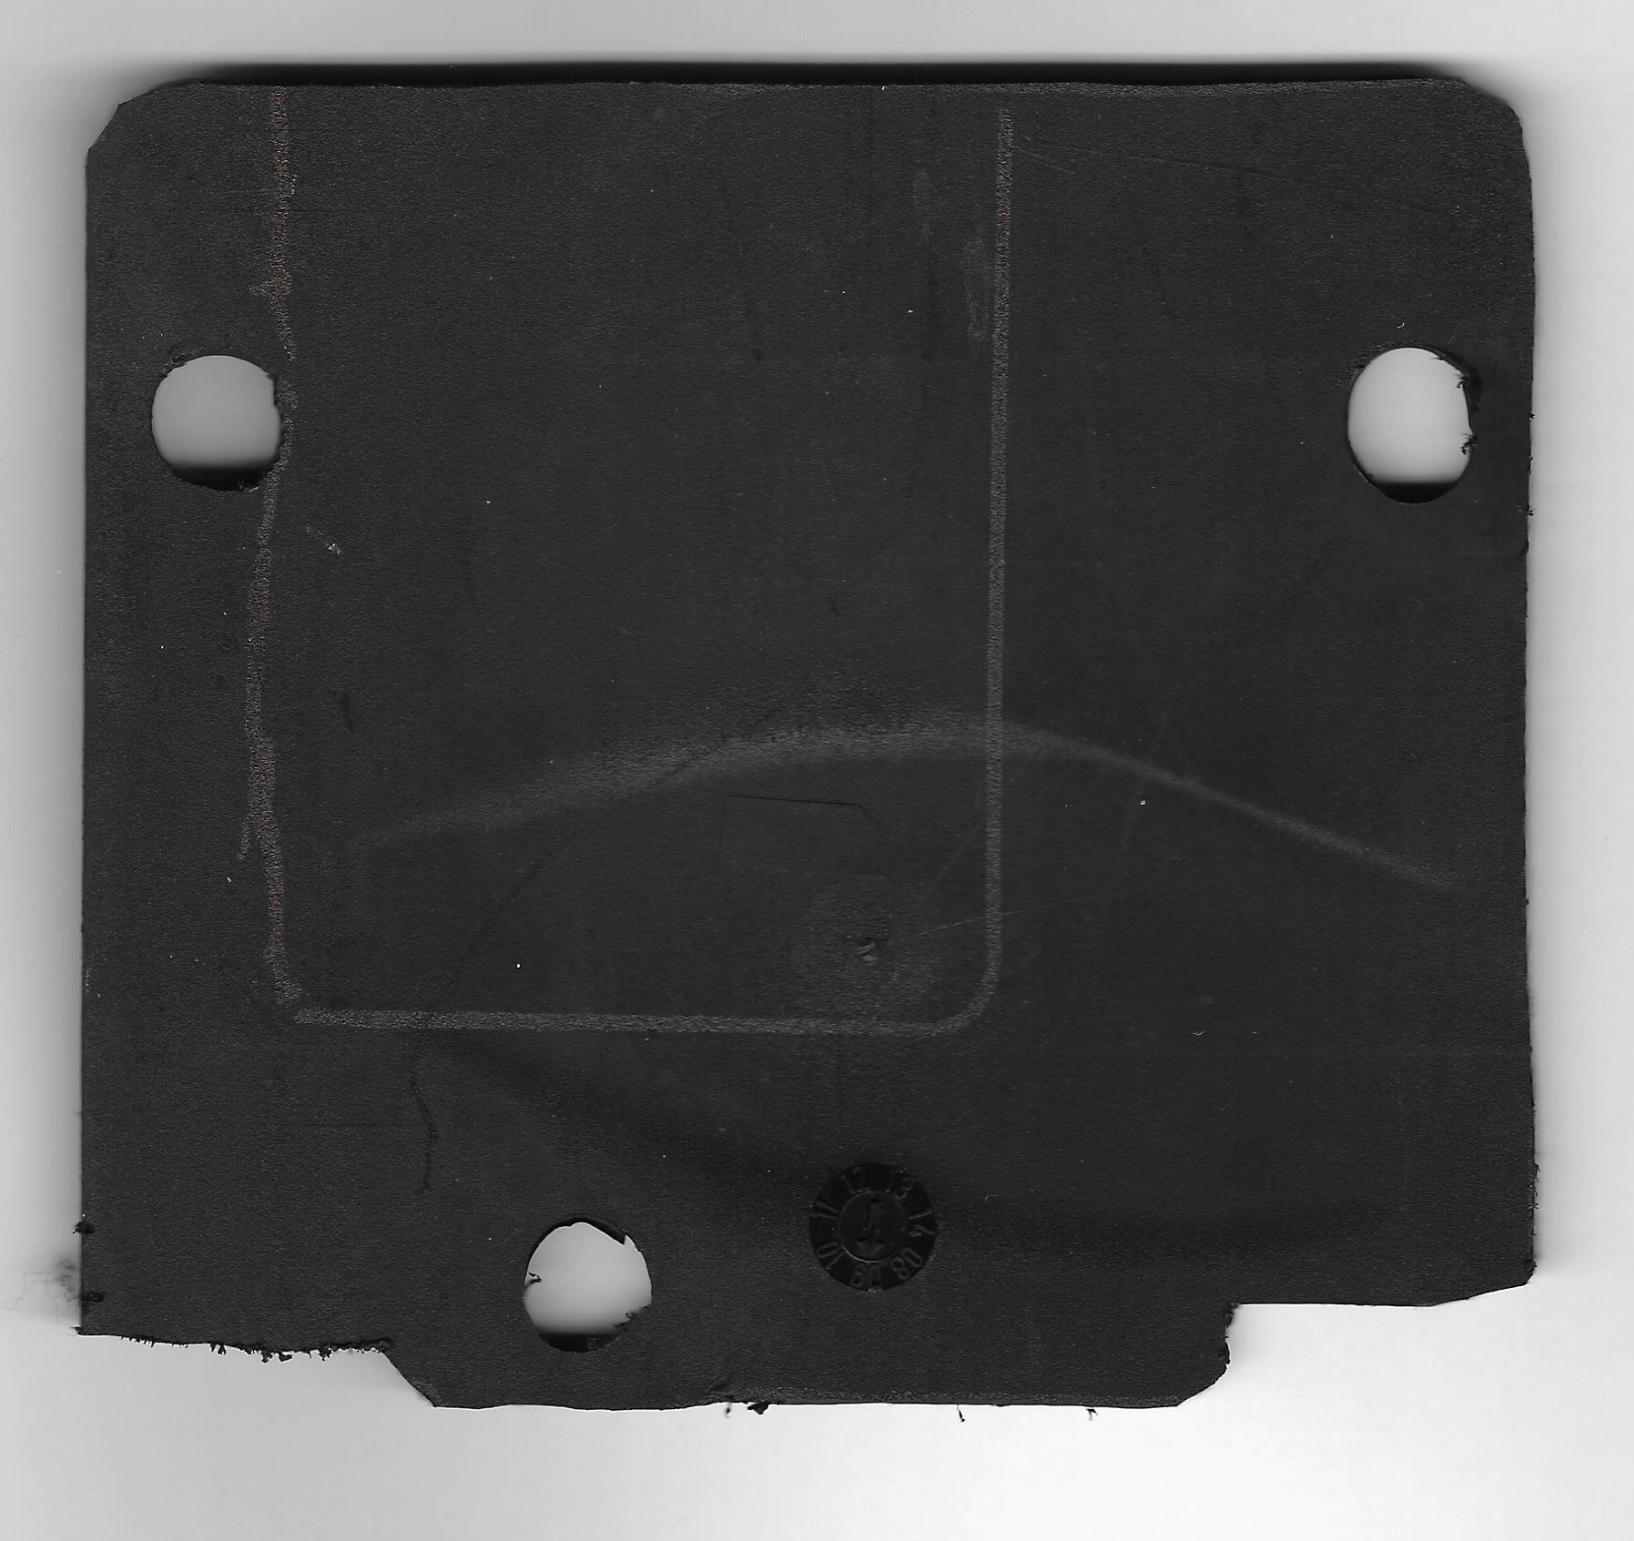 black fuse box private sharing about wiring diagram u2022 rh caraccessoriesandsoftware co uk